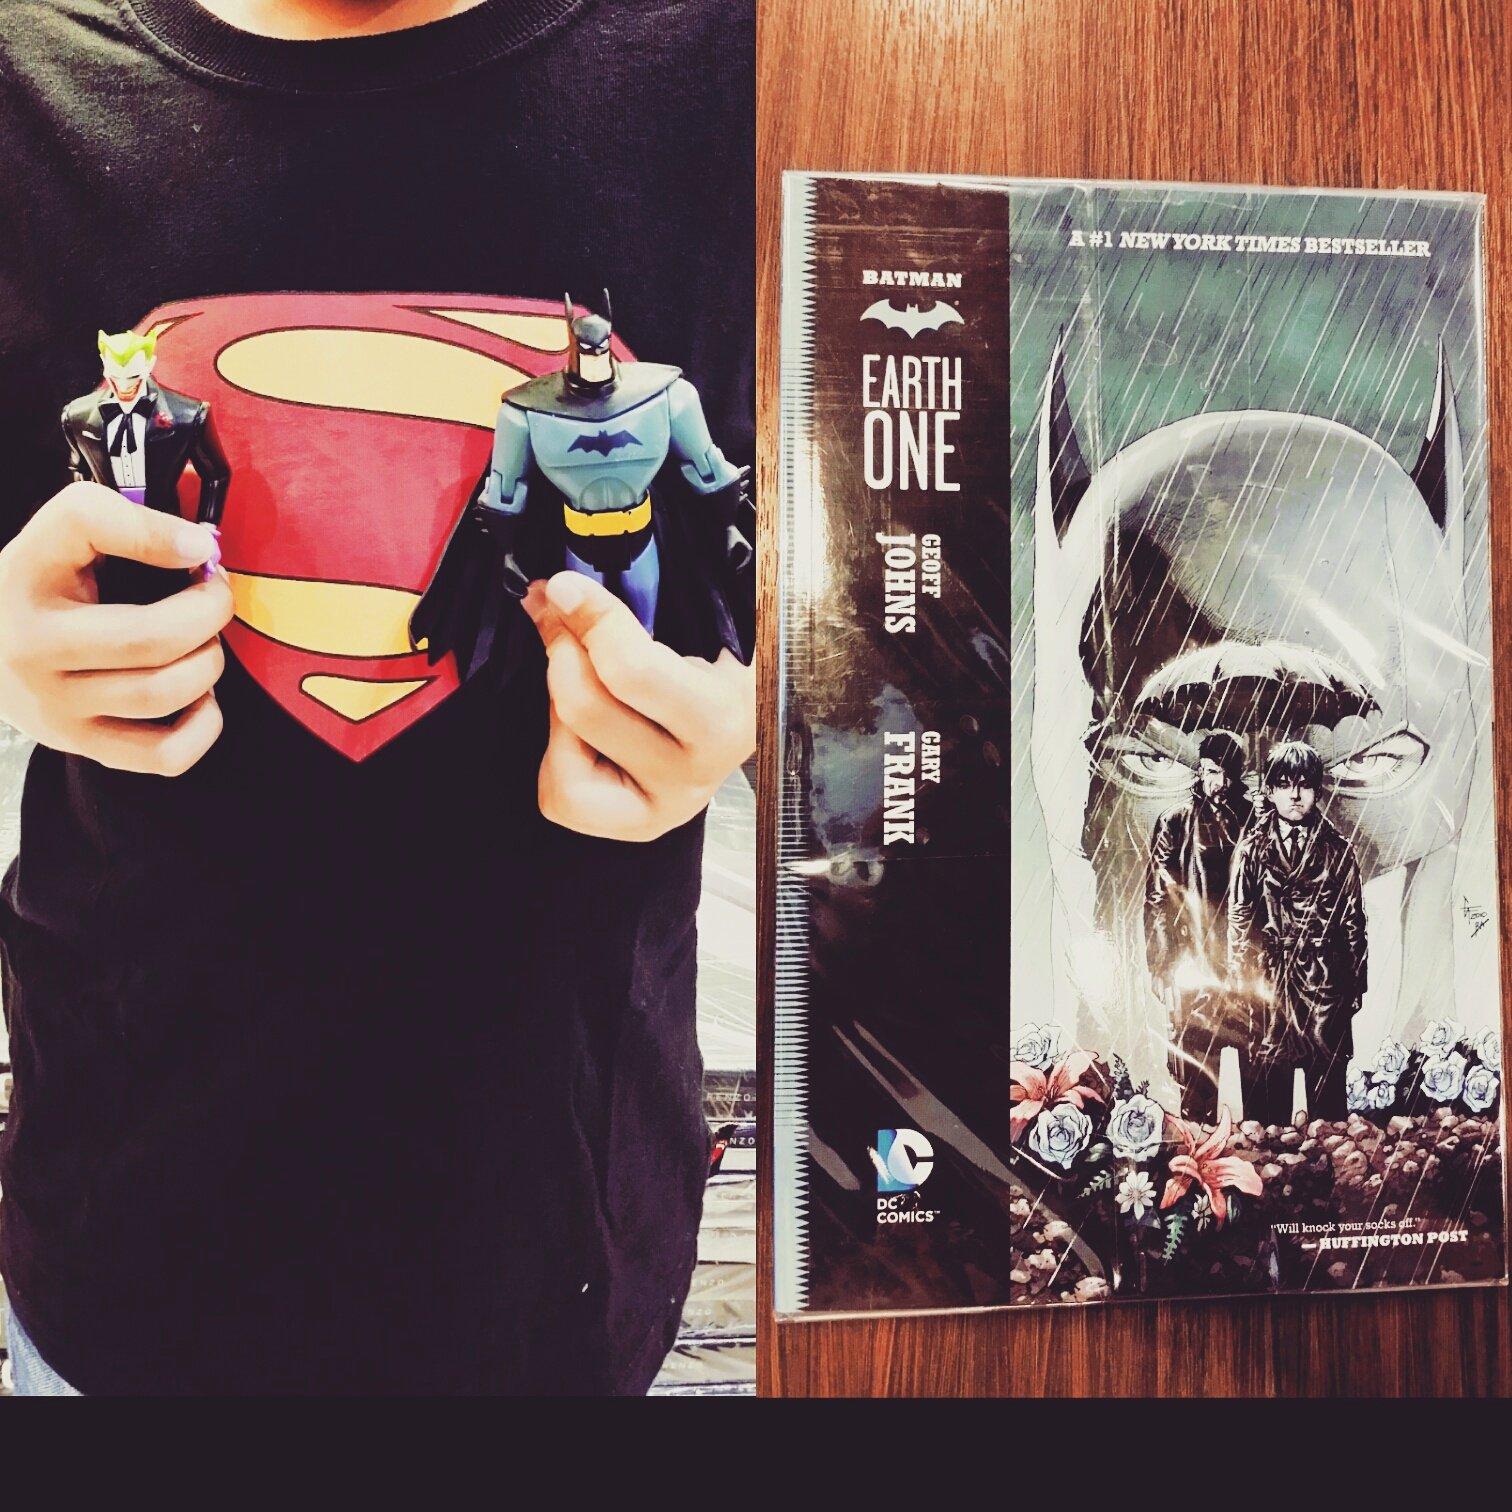 #todayshaul at the #fleamarket #batmantheanimatedseries #batman #joker #geoffjohns #earthonebatman #tpb #geekshavethemostfun